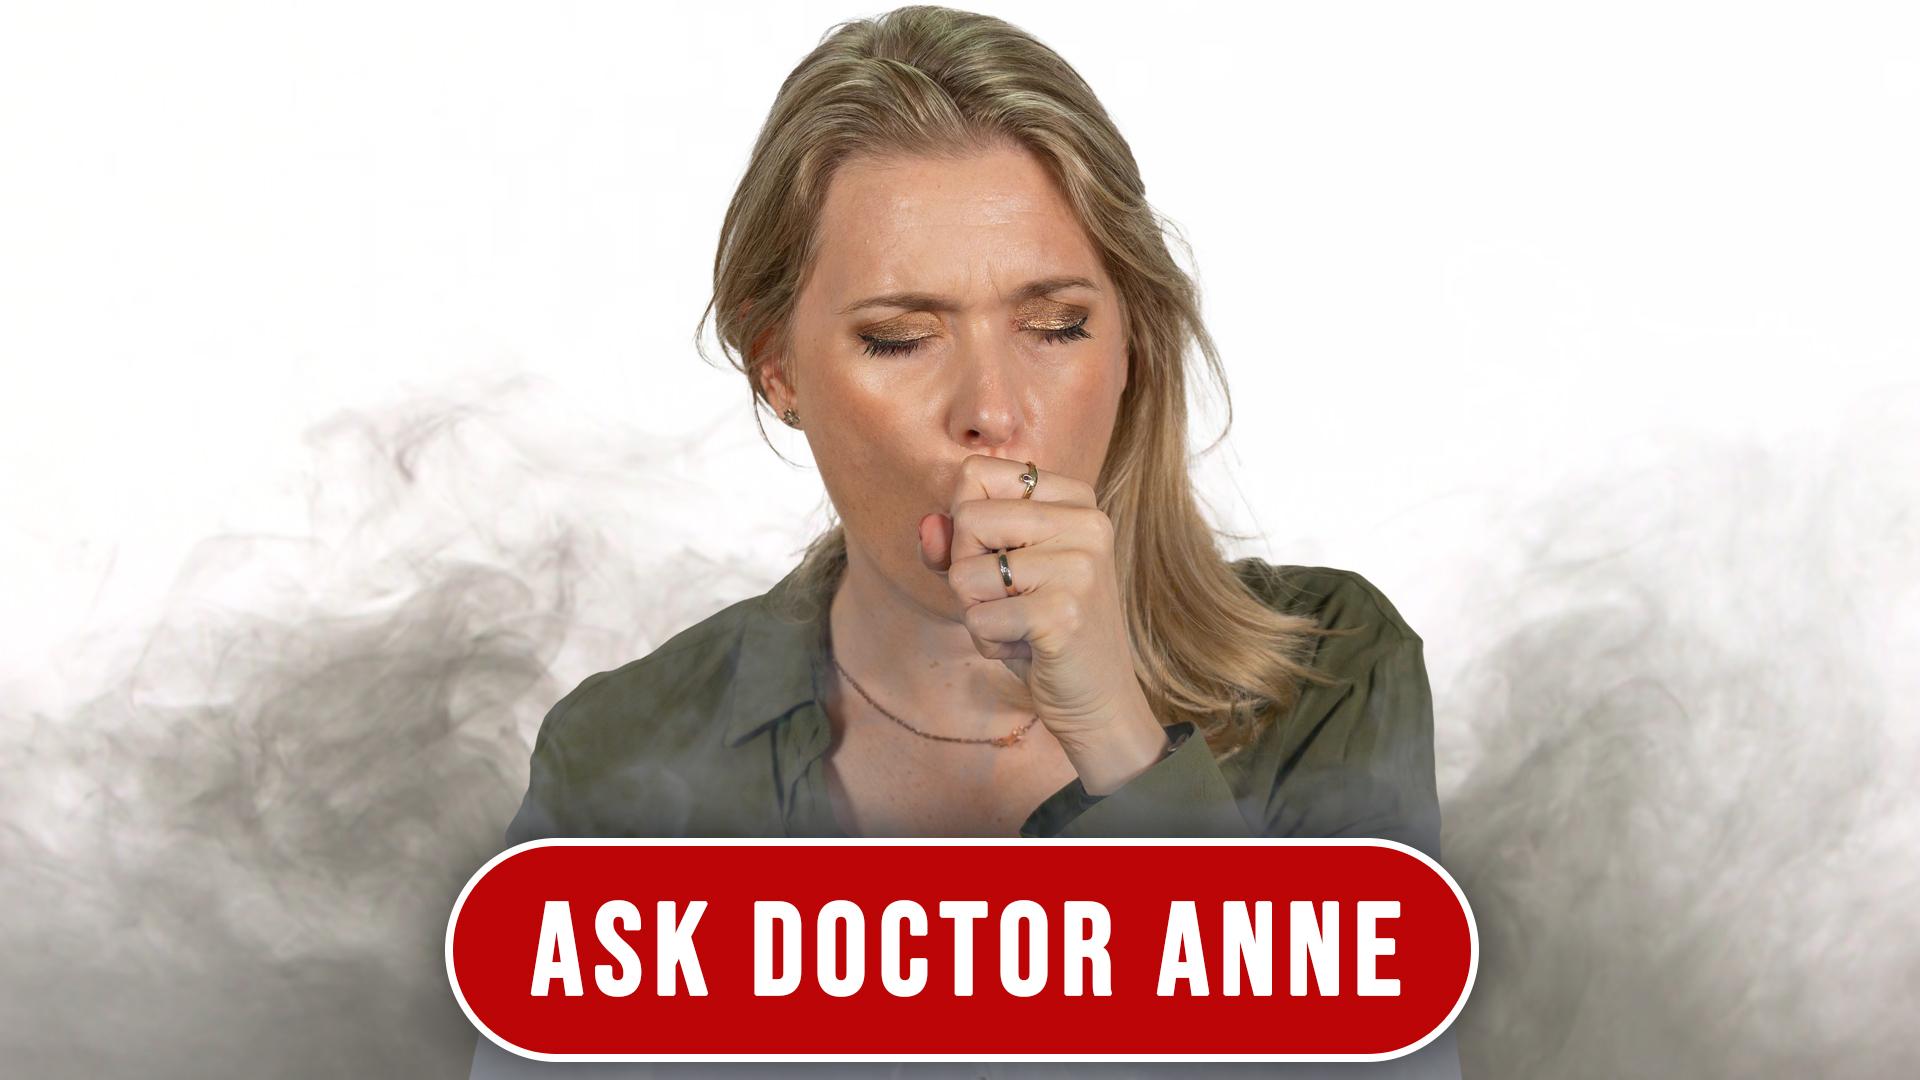 Do you need anti pollution skincare?